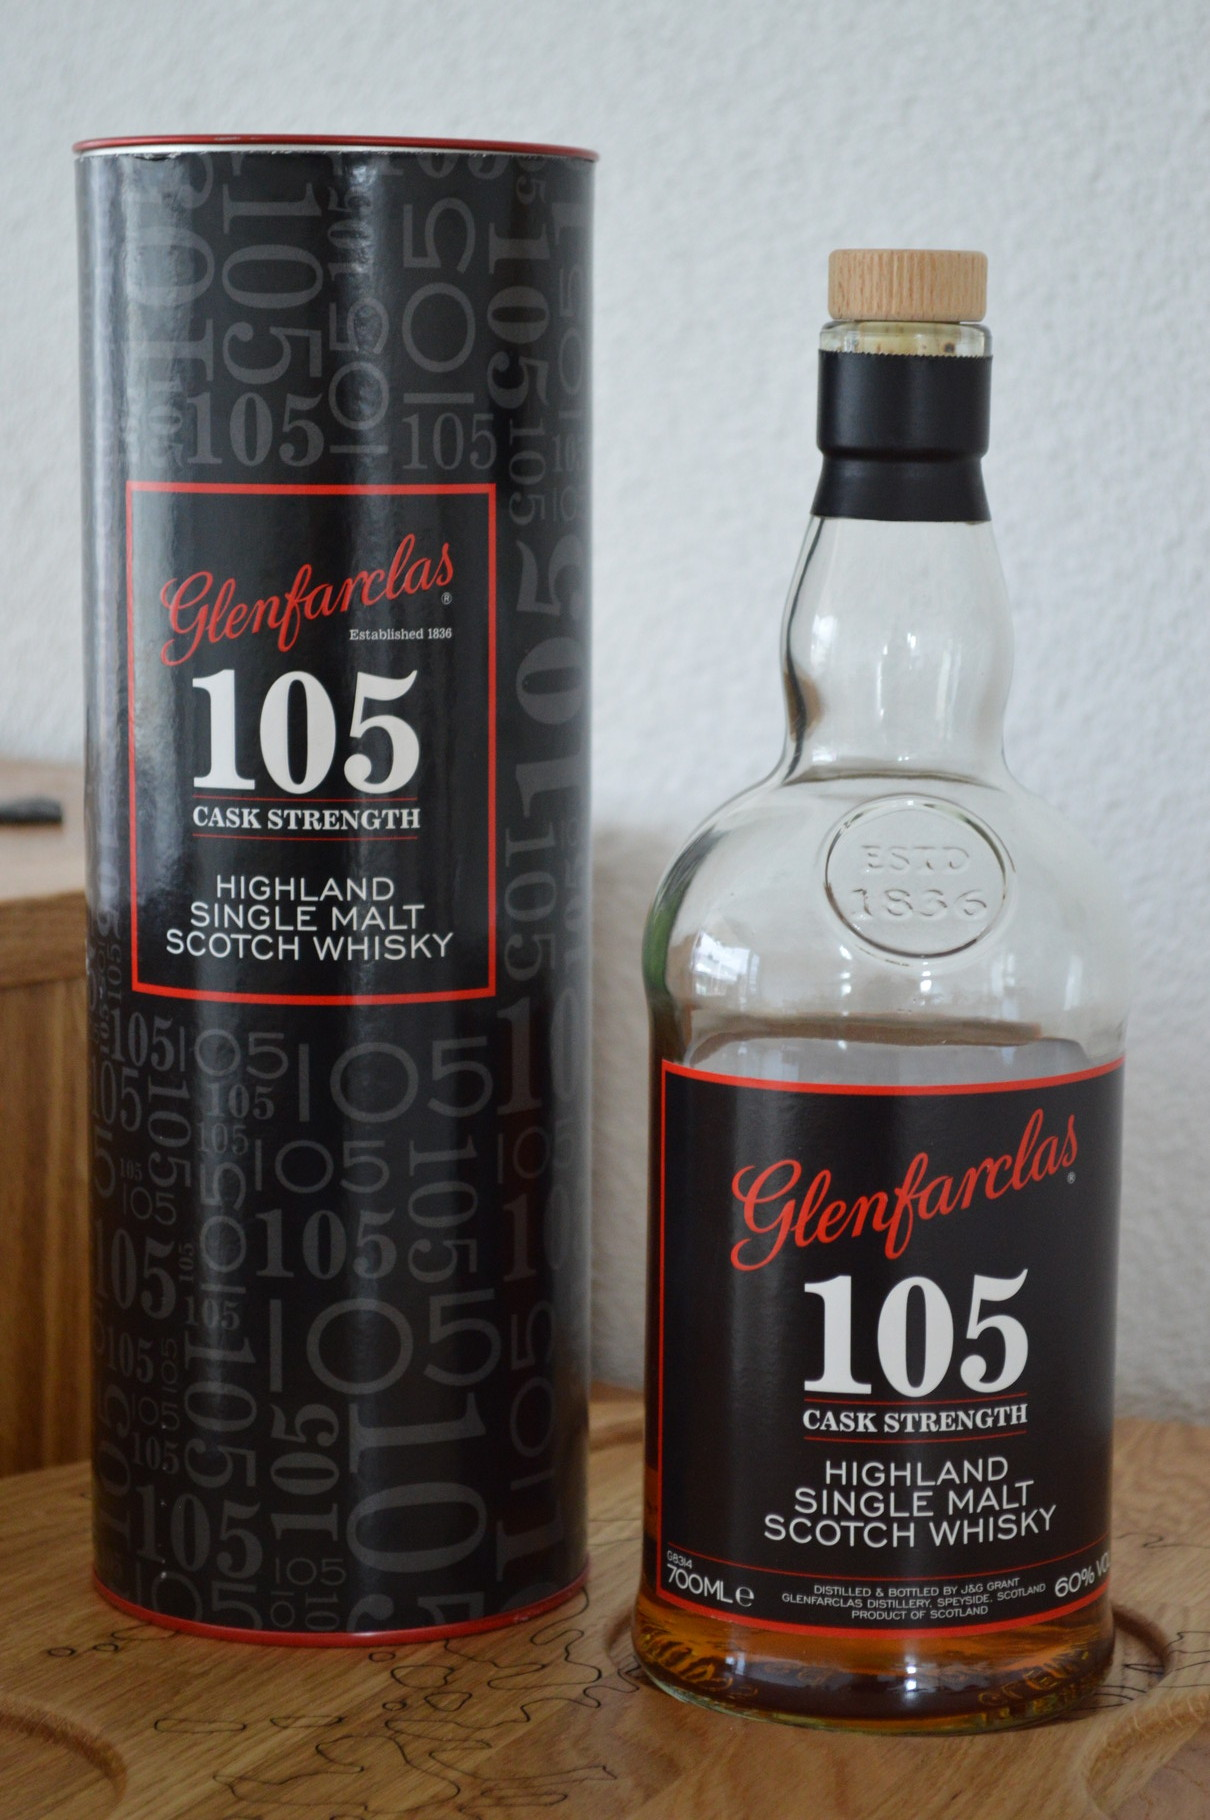 SPEYSIDE - Glenfarclas* - Bottler: Original - 70cl - 60% - 105